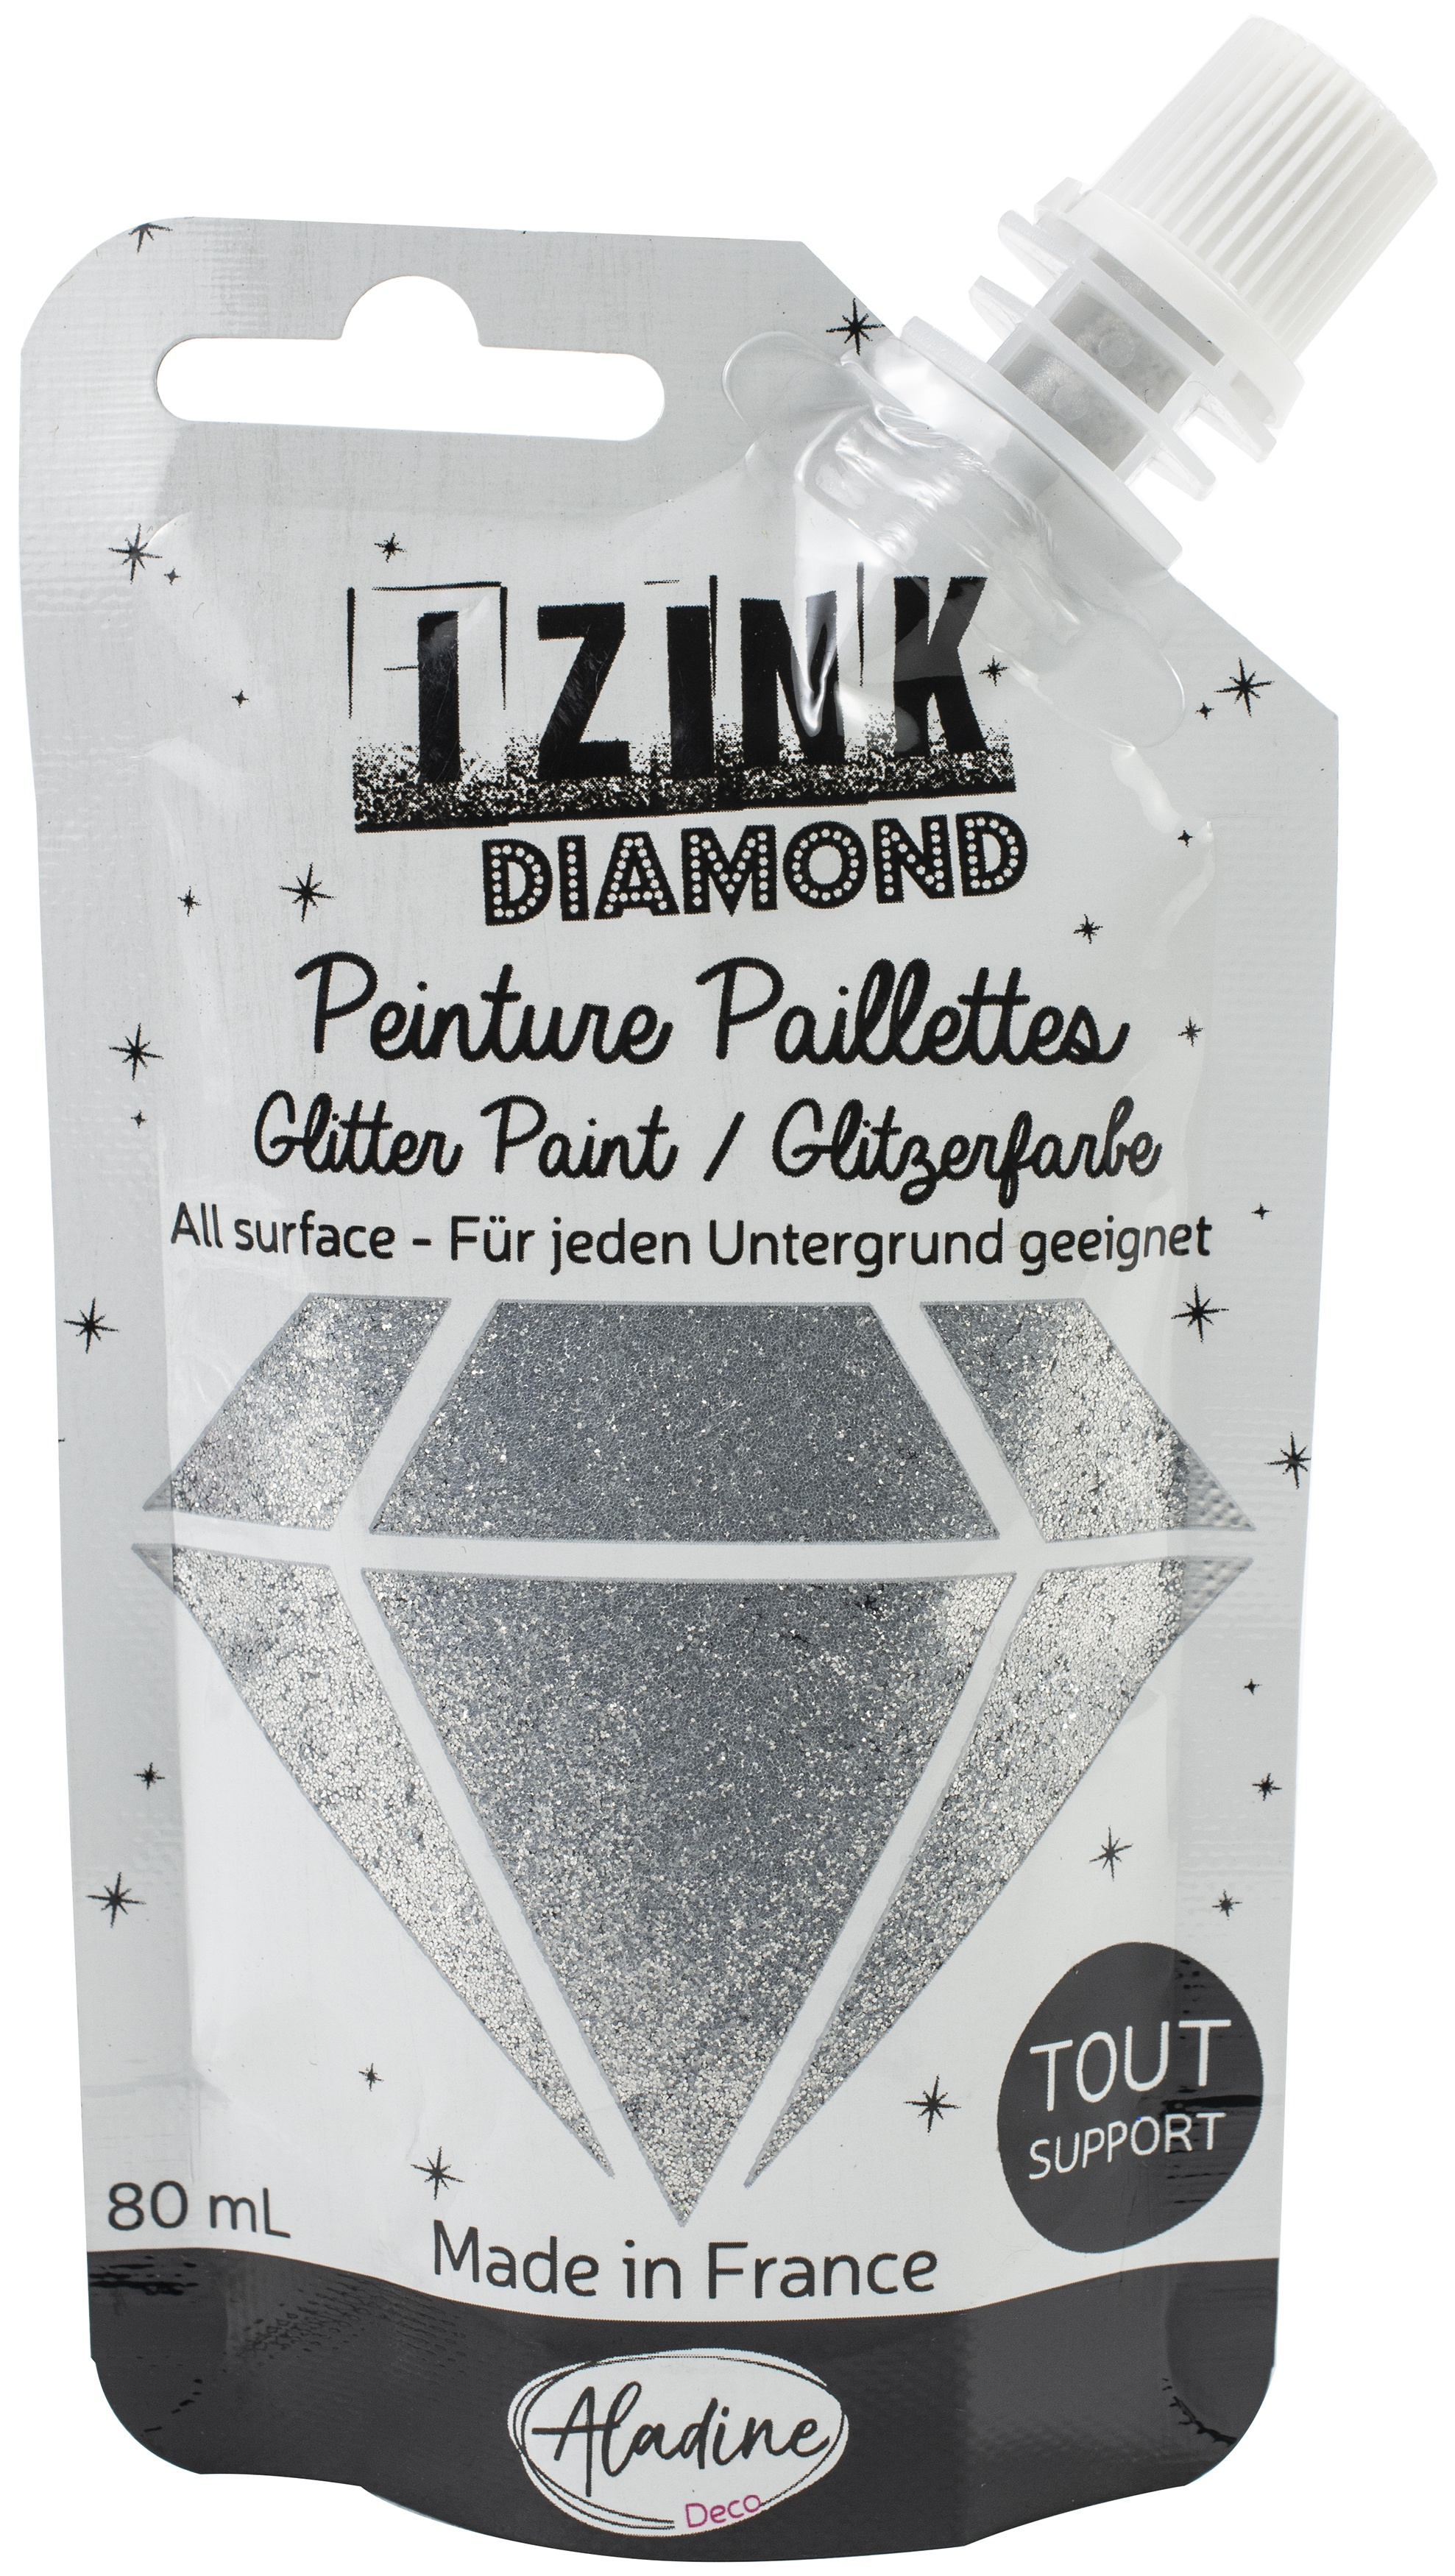 IZINK Diamond Glitter Paint - Argente | Silver